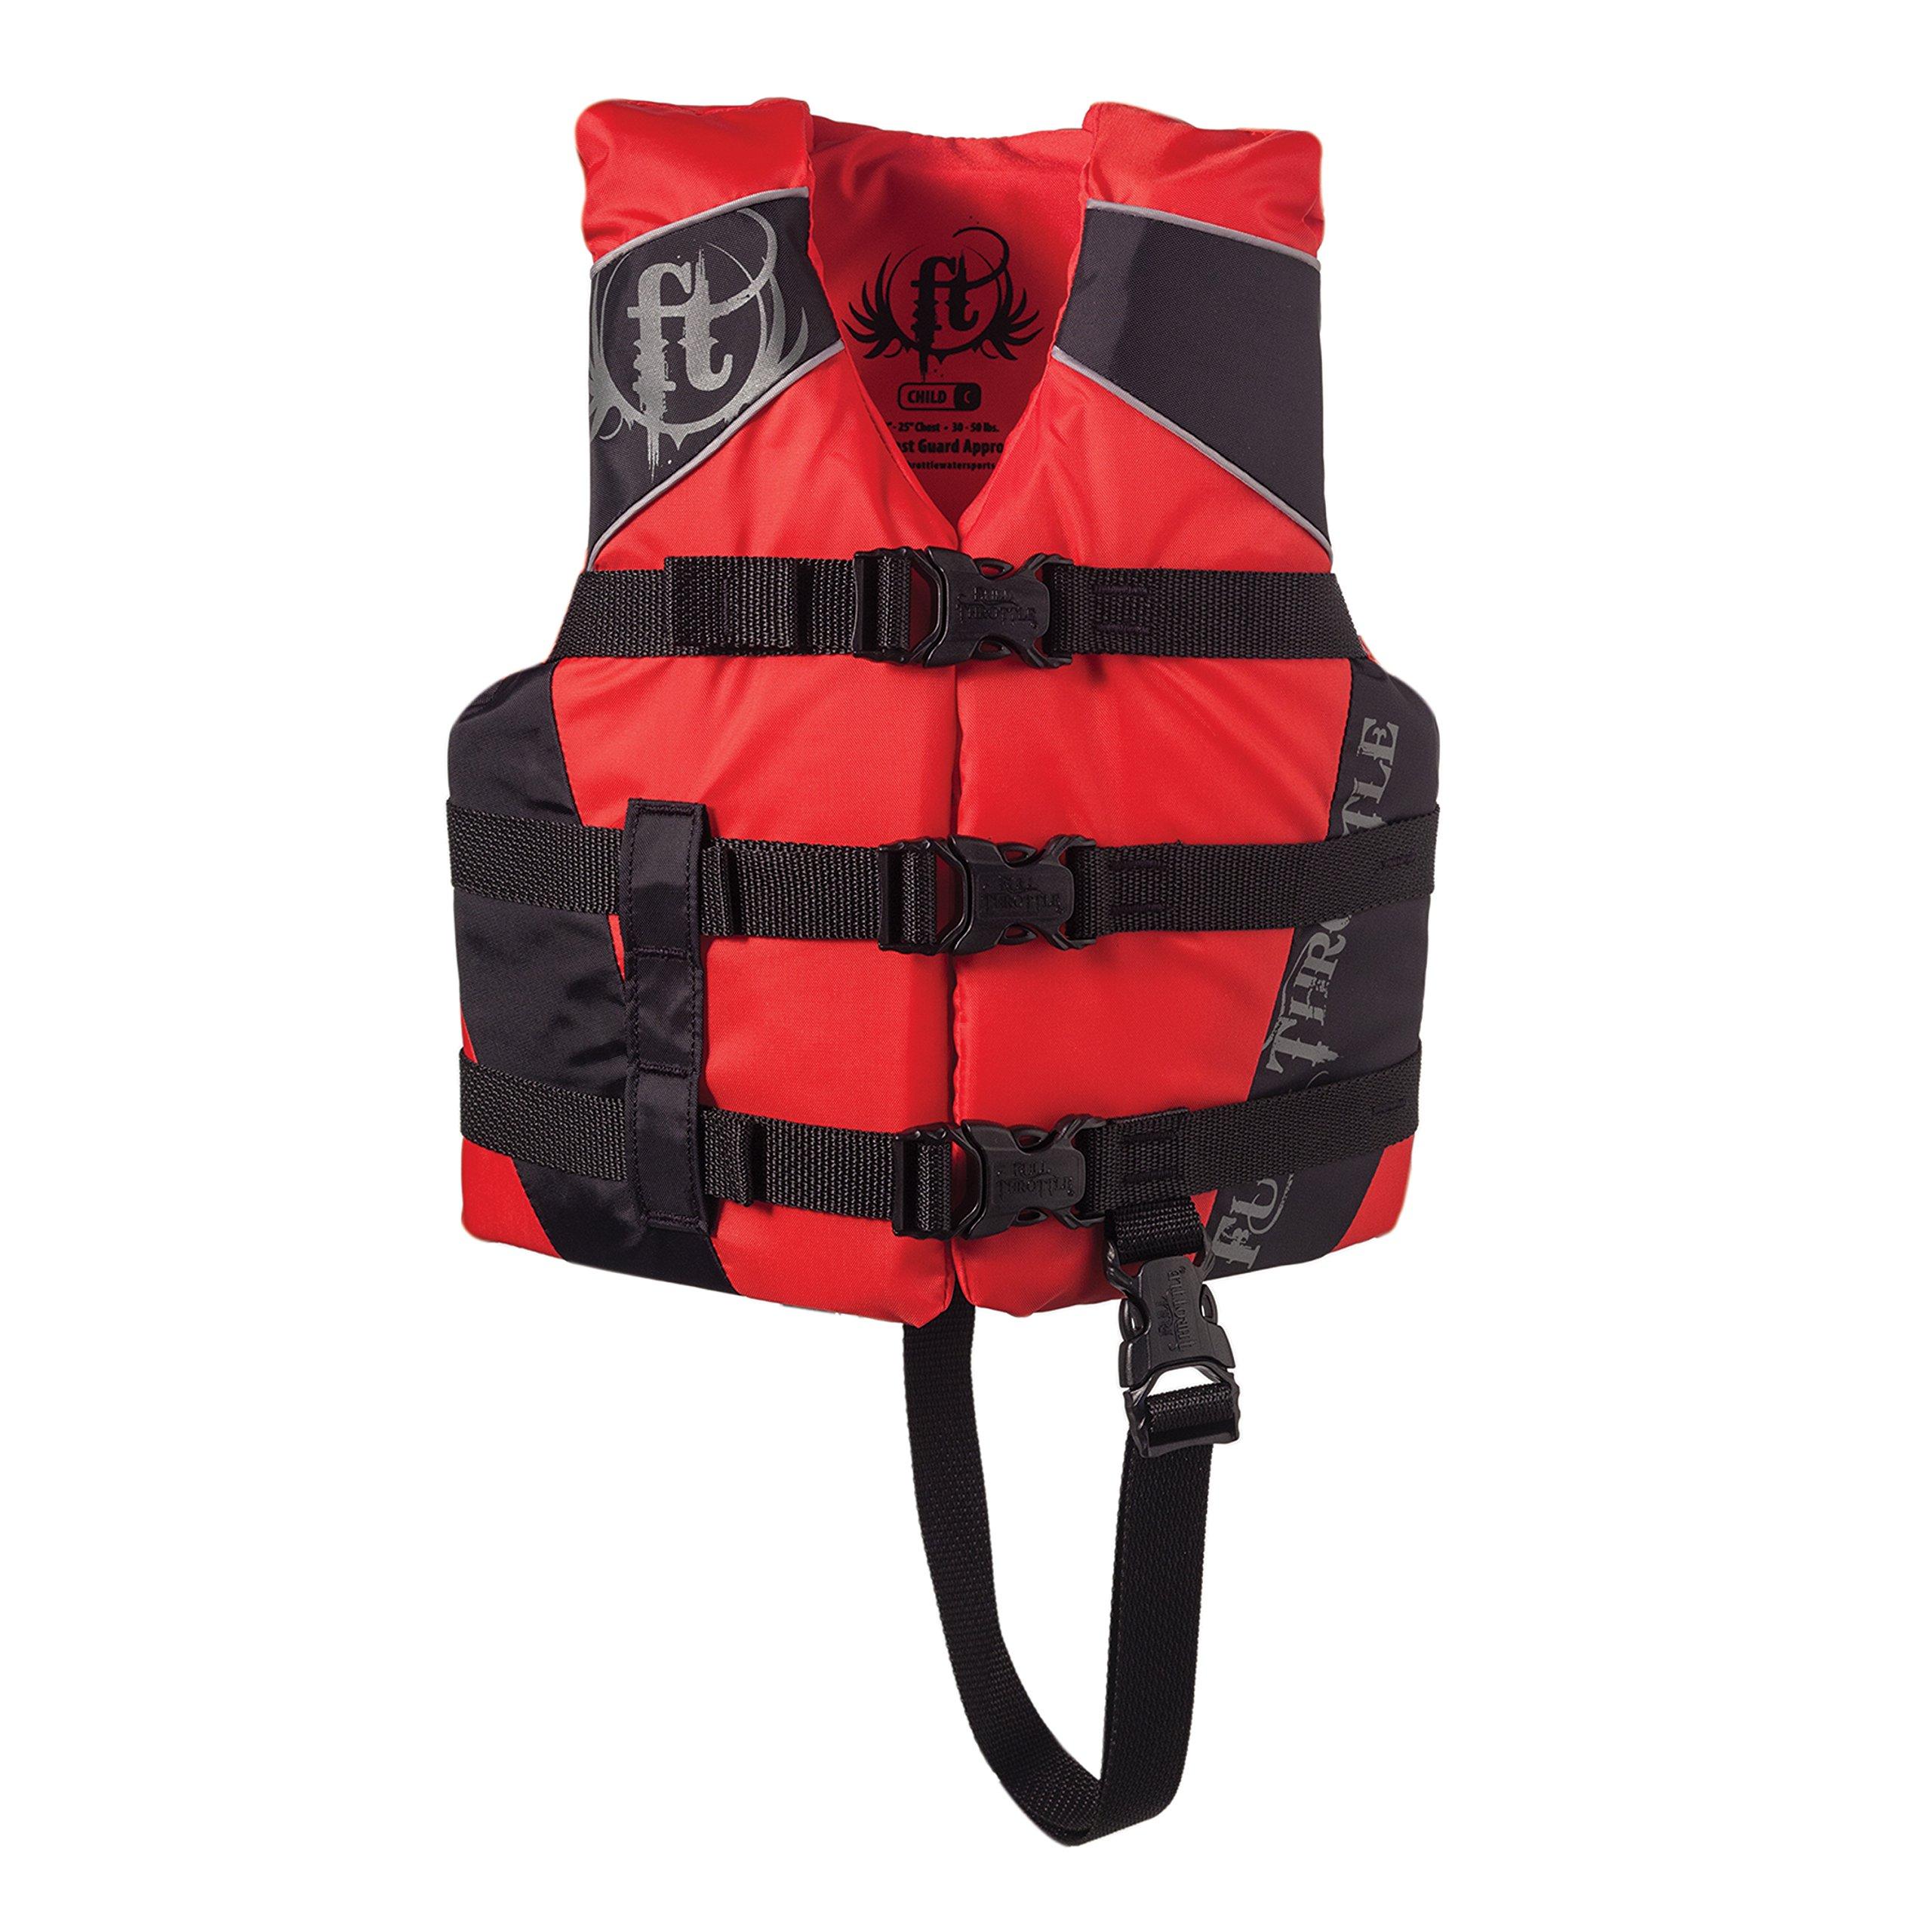 Full Throttle Child Nylon Watersports Vest - Red/Black